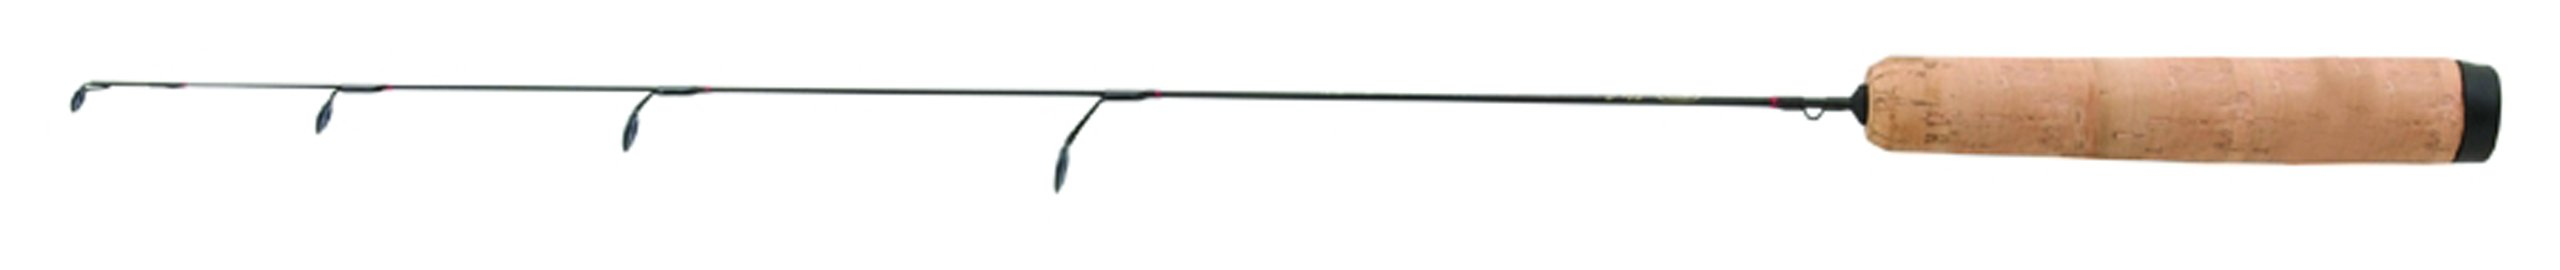 Clam 8479 JM Med Spinning Walleye Rod, 28-Inch